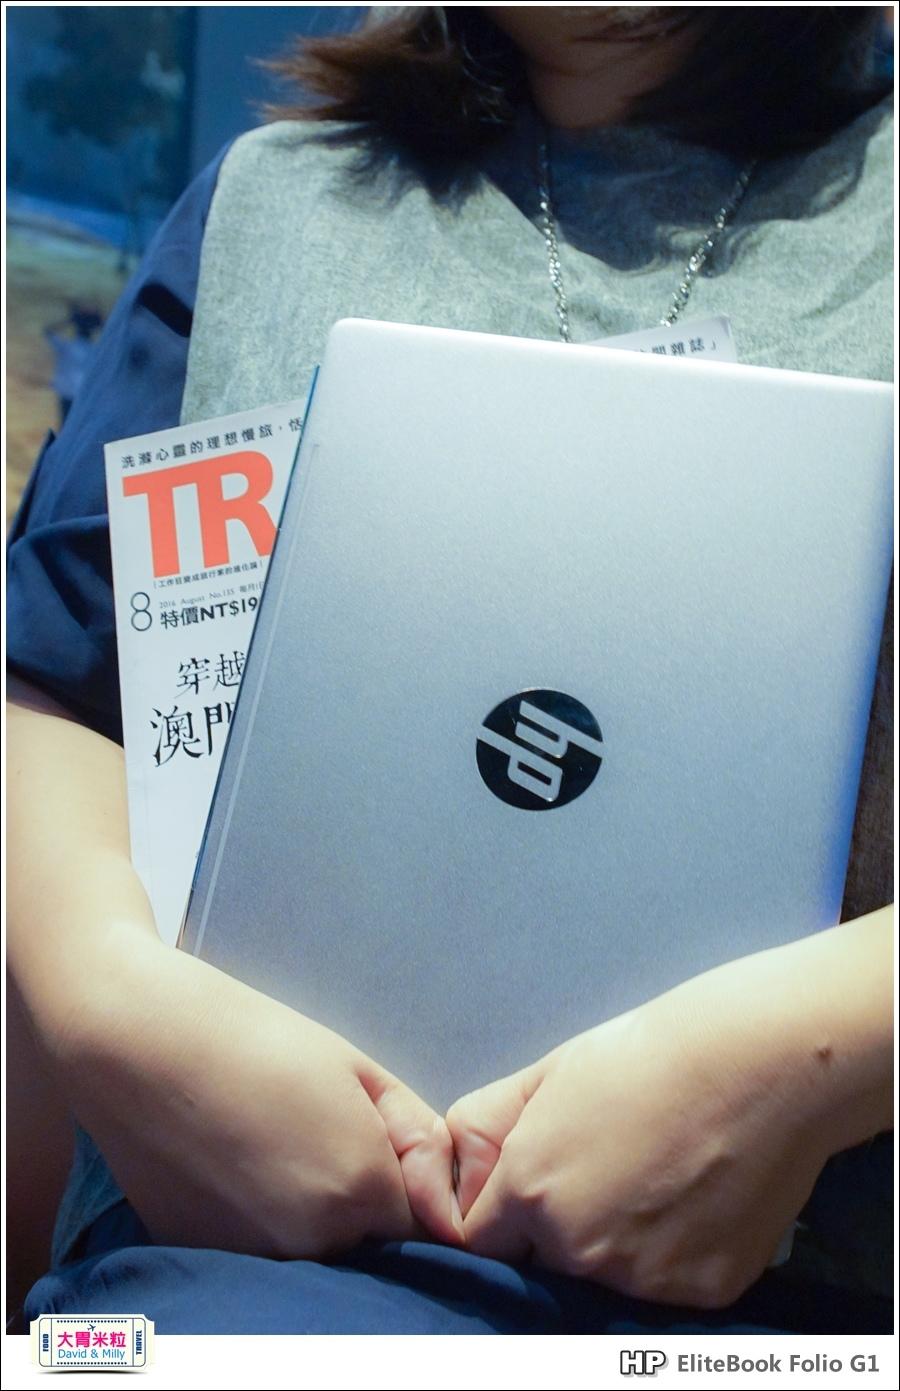 HP EliteBook Folio G1@大胃米粒042 (2).jpg